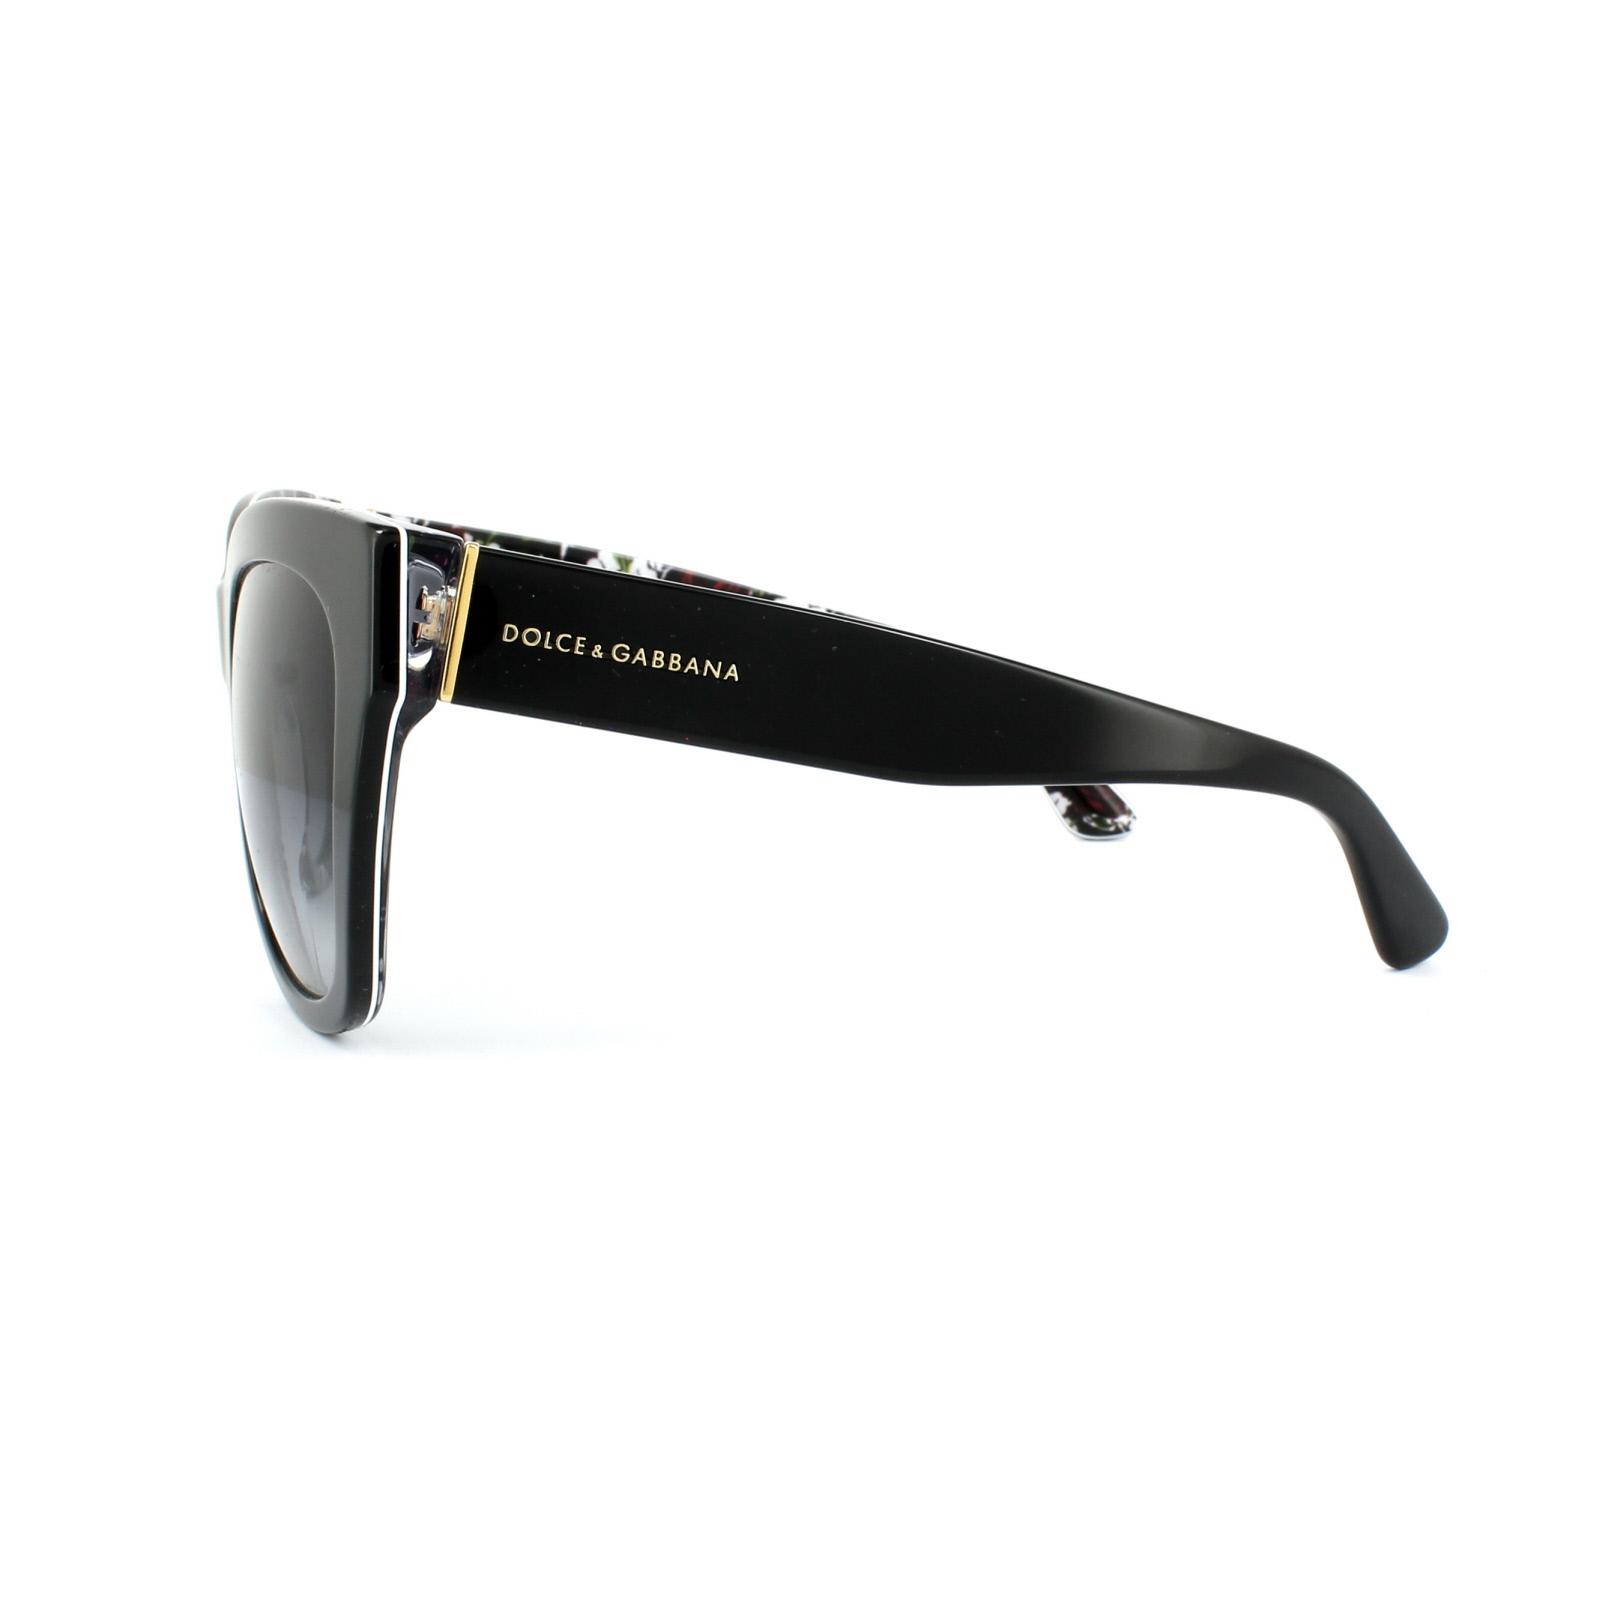 Dolce Gabbana Sunglasses Black  dolce gabbana sunglasses 4270 3021 8g black roses grey grant